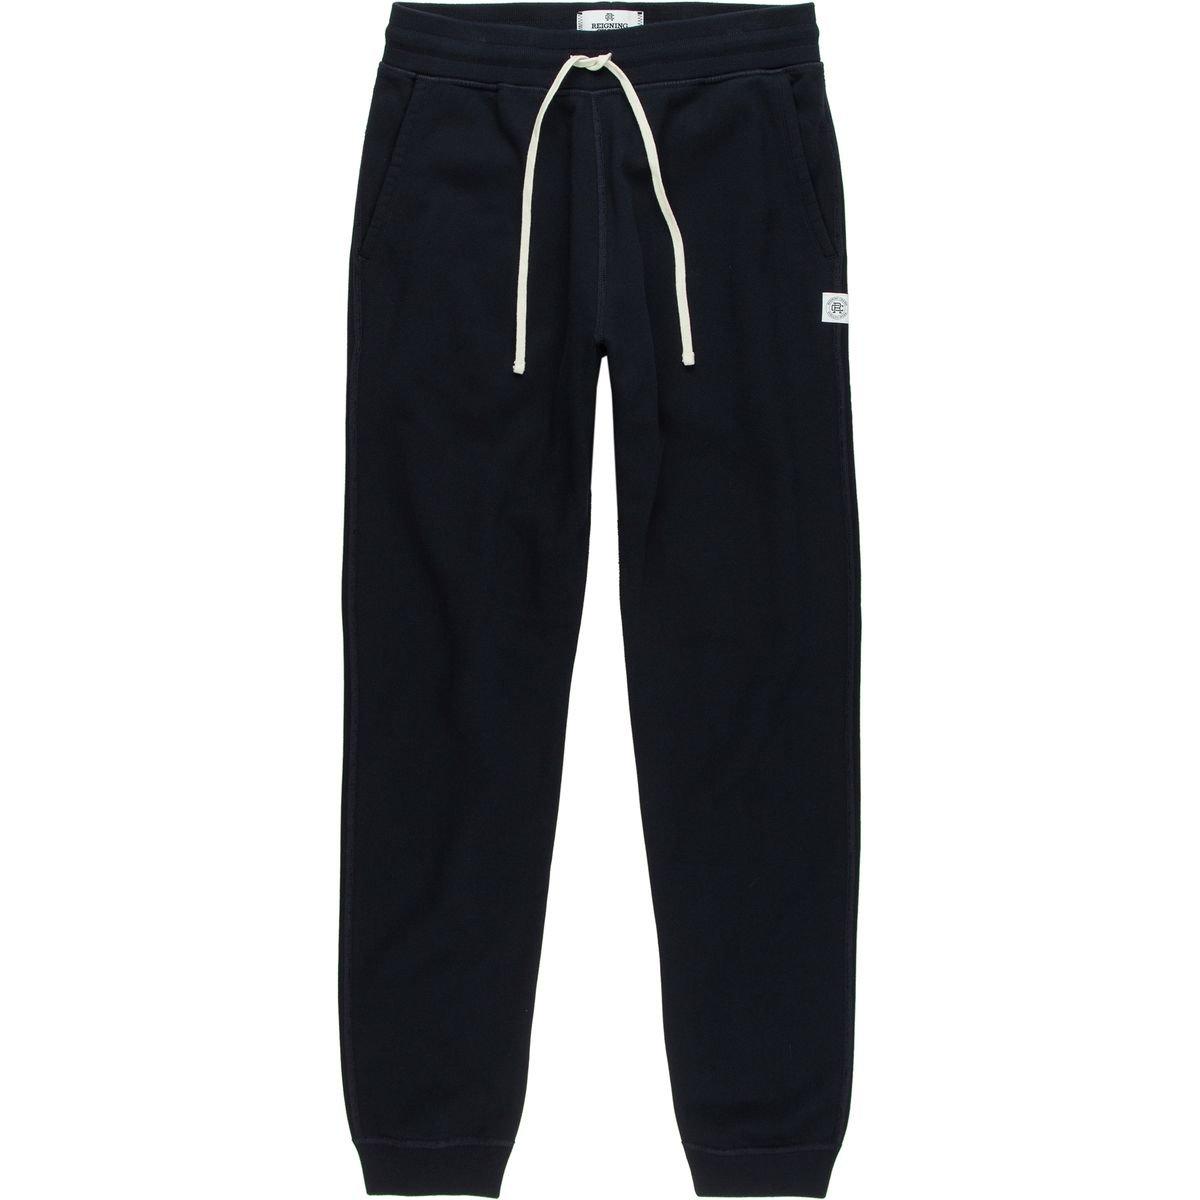 Reigning Champ Men's Terry Slim Sweatpants, Navy, X-Large